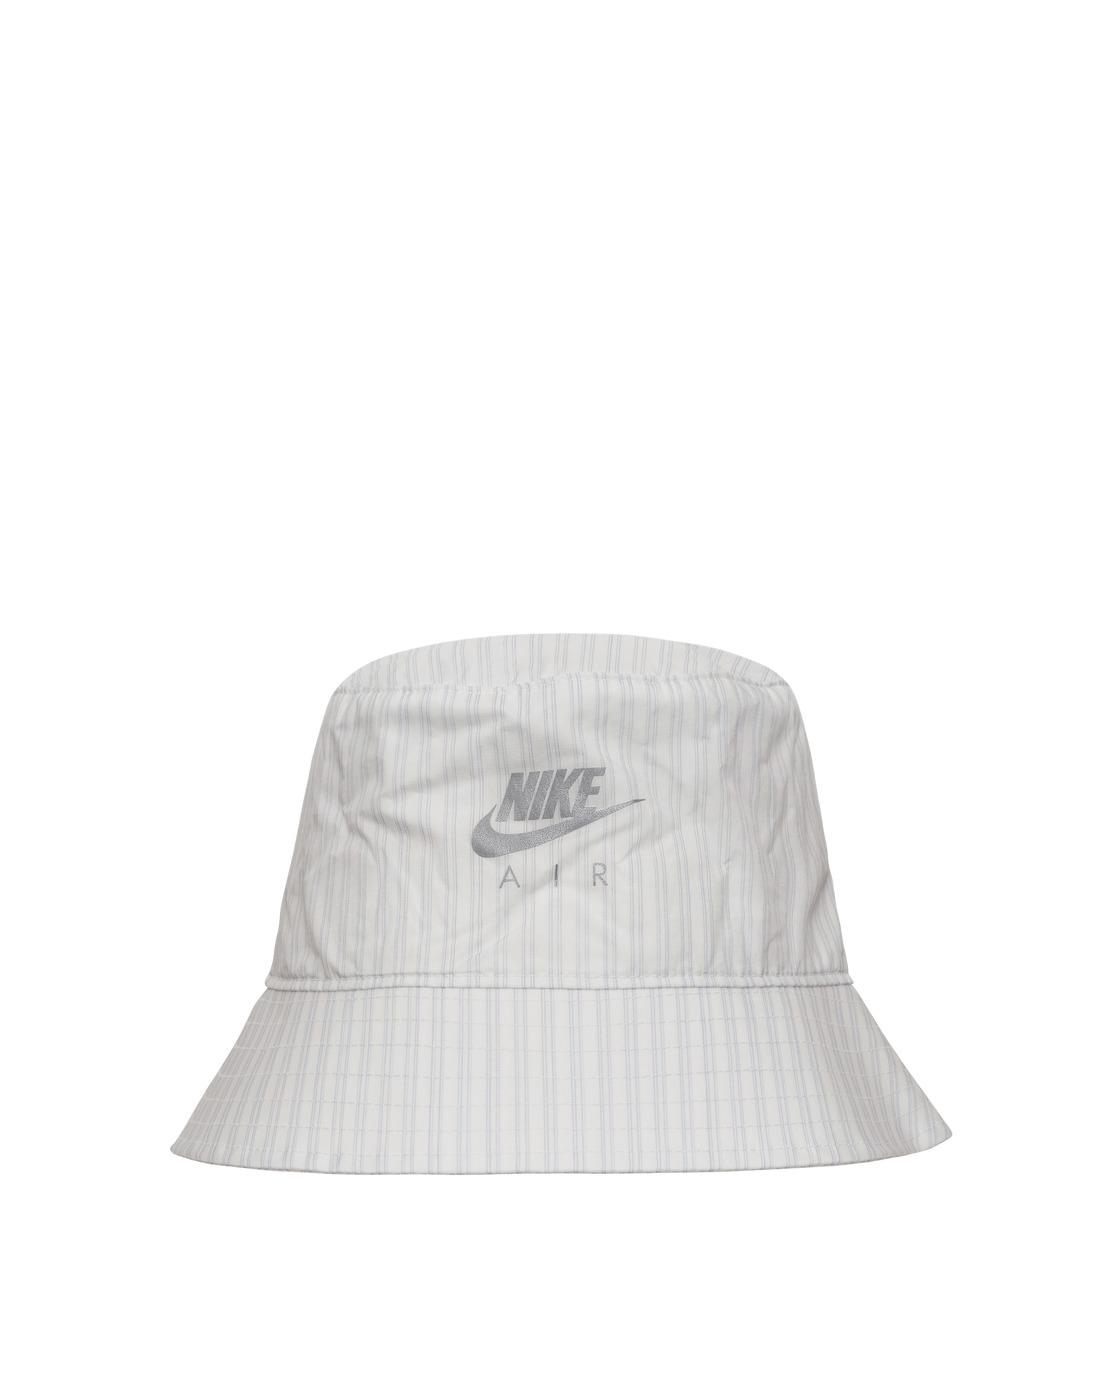 Nike Special Project Kim Jones Bucket Hat White